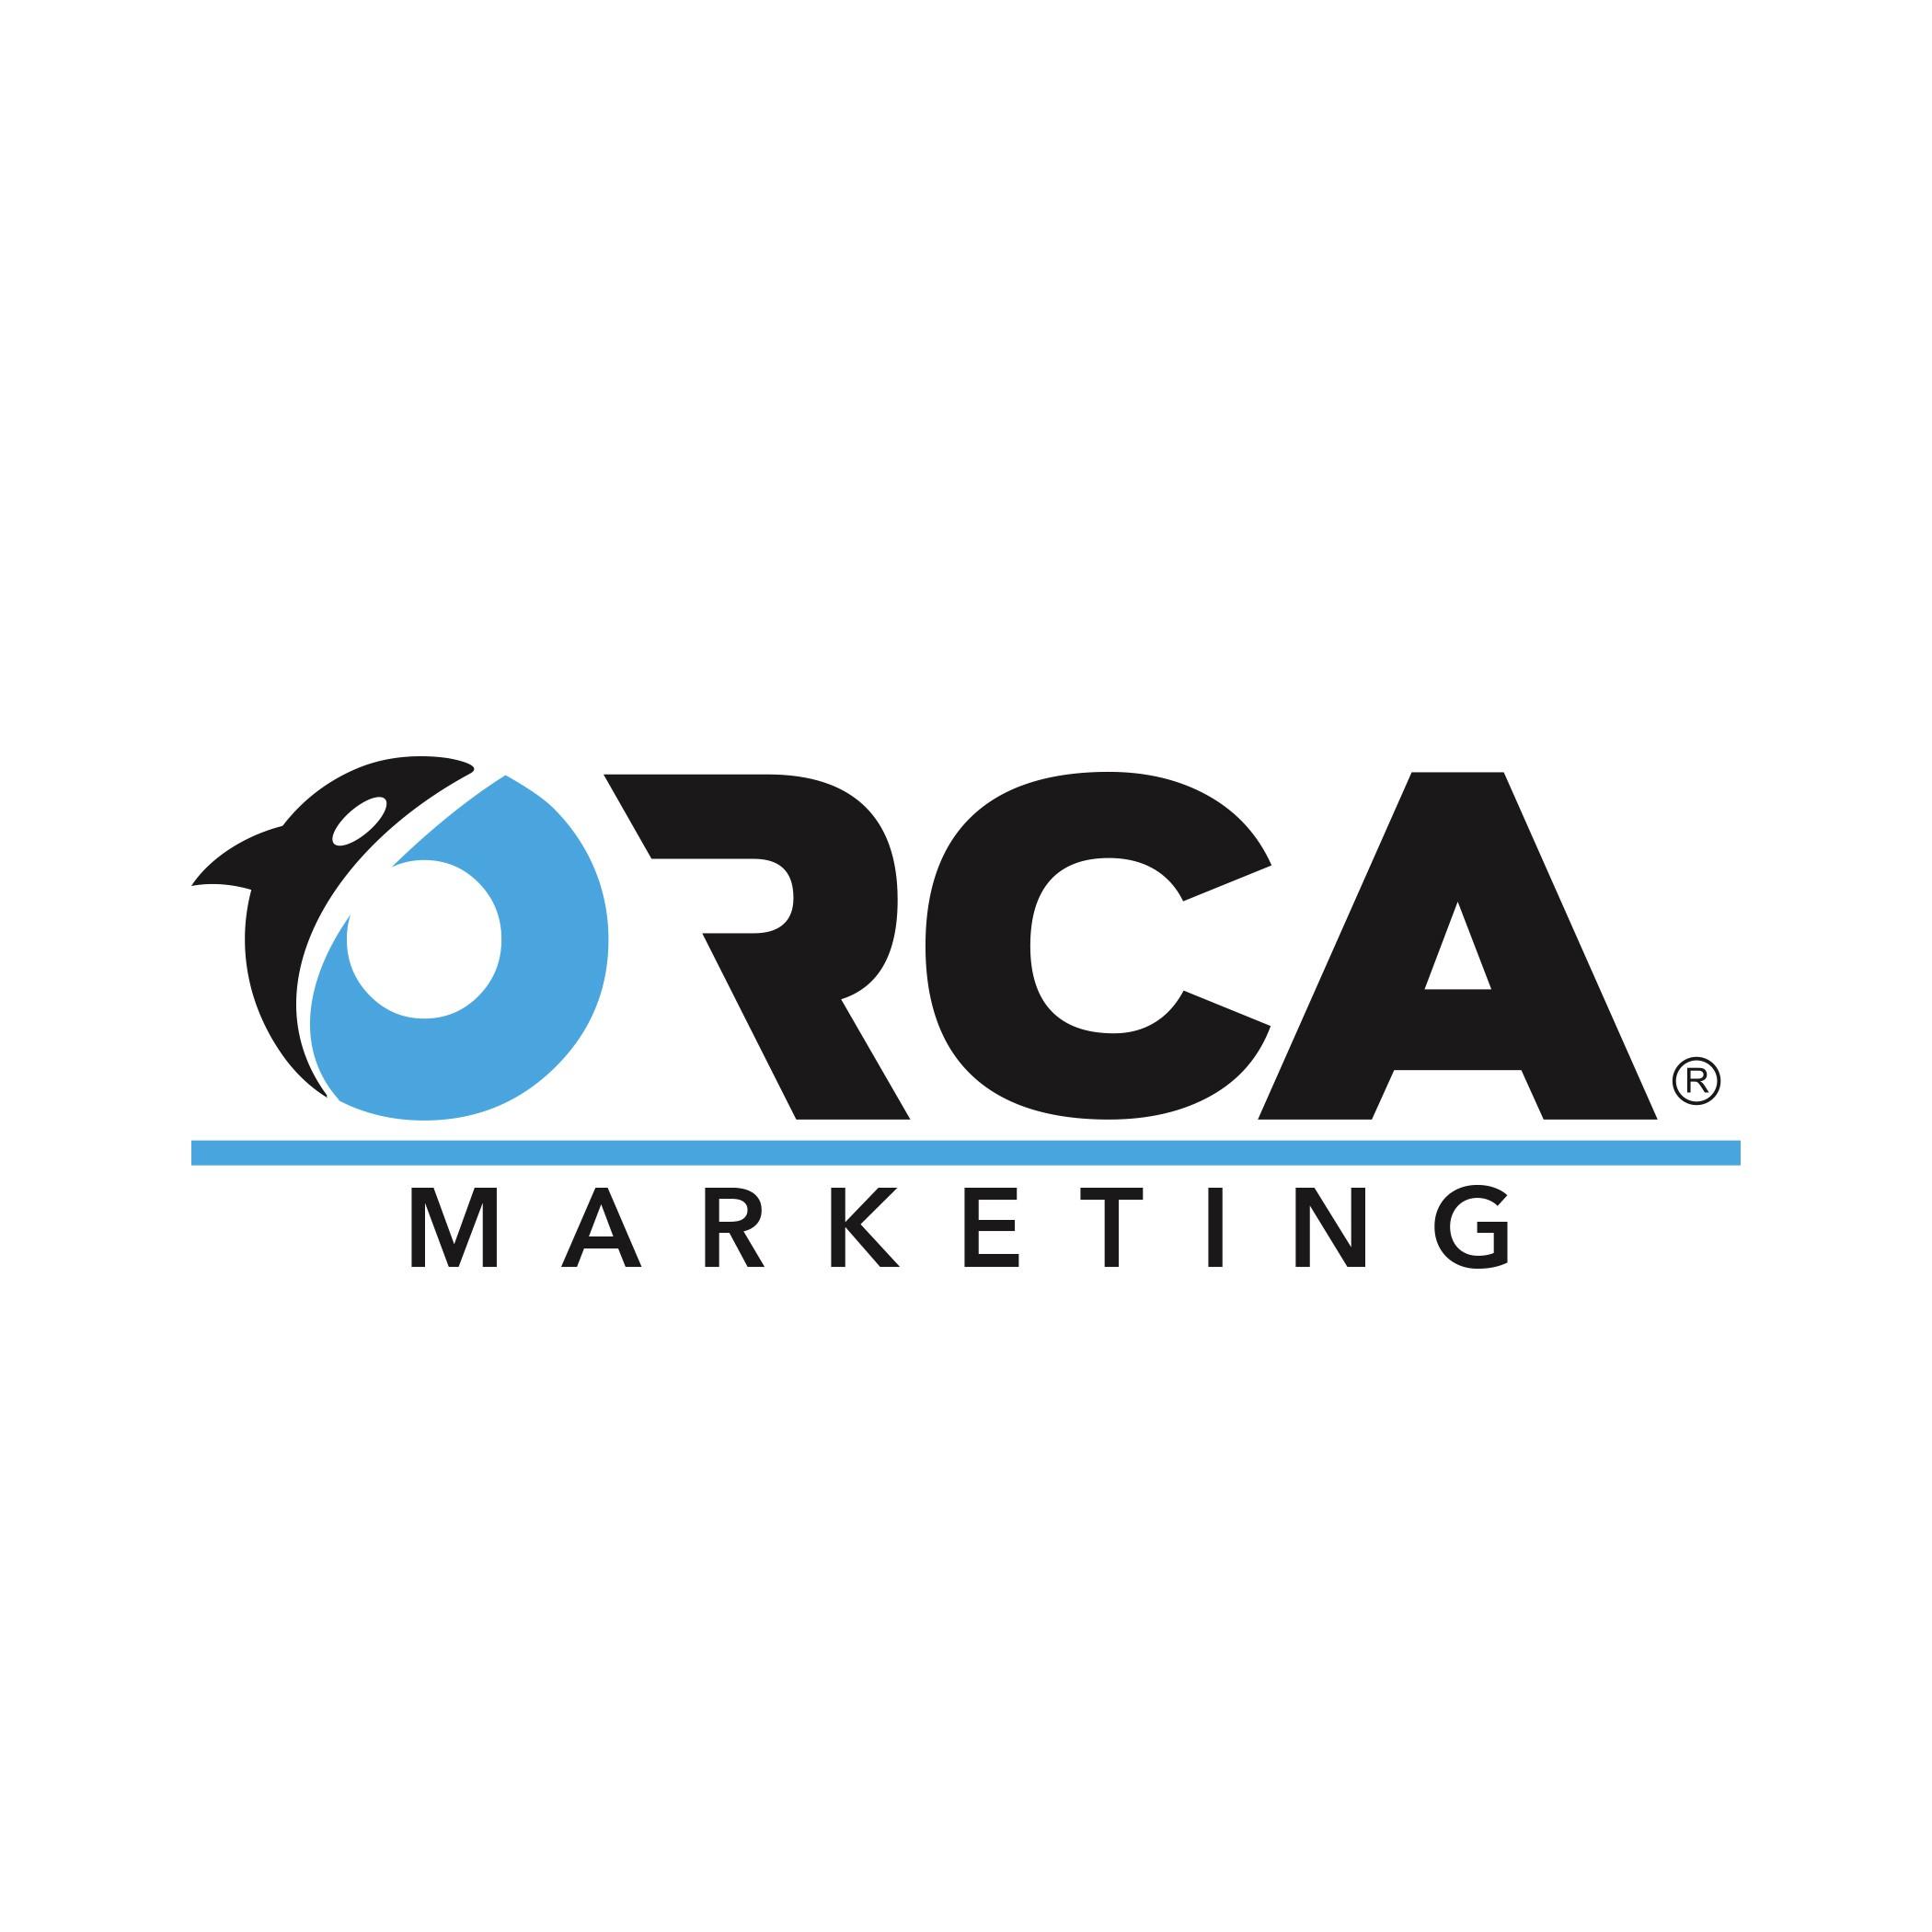 Orca Marketing